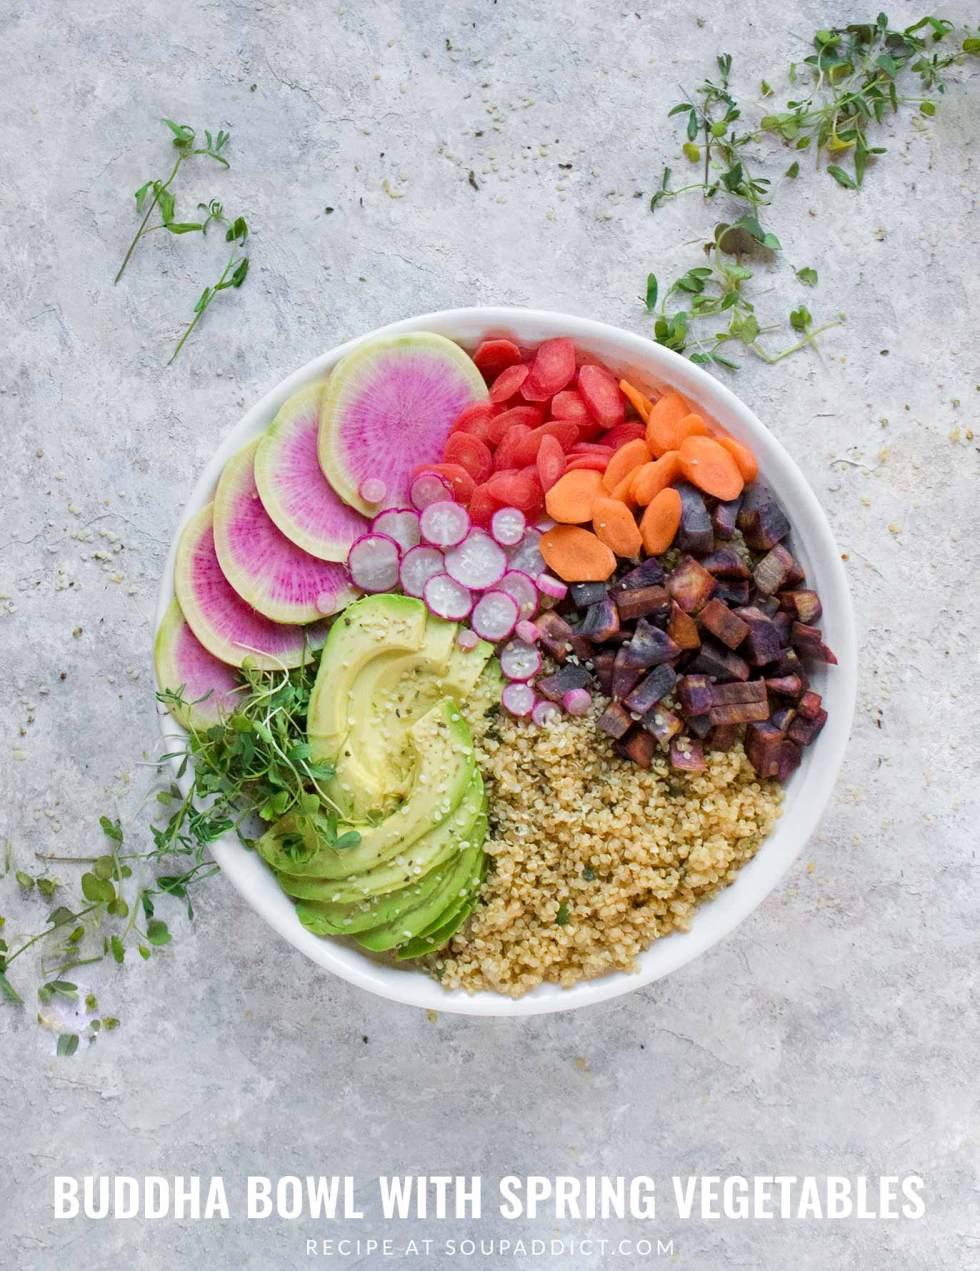 Buddha Bowl with Spring Vegetables - Recipe at SoupAddict.com